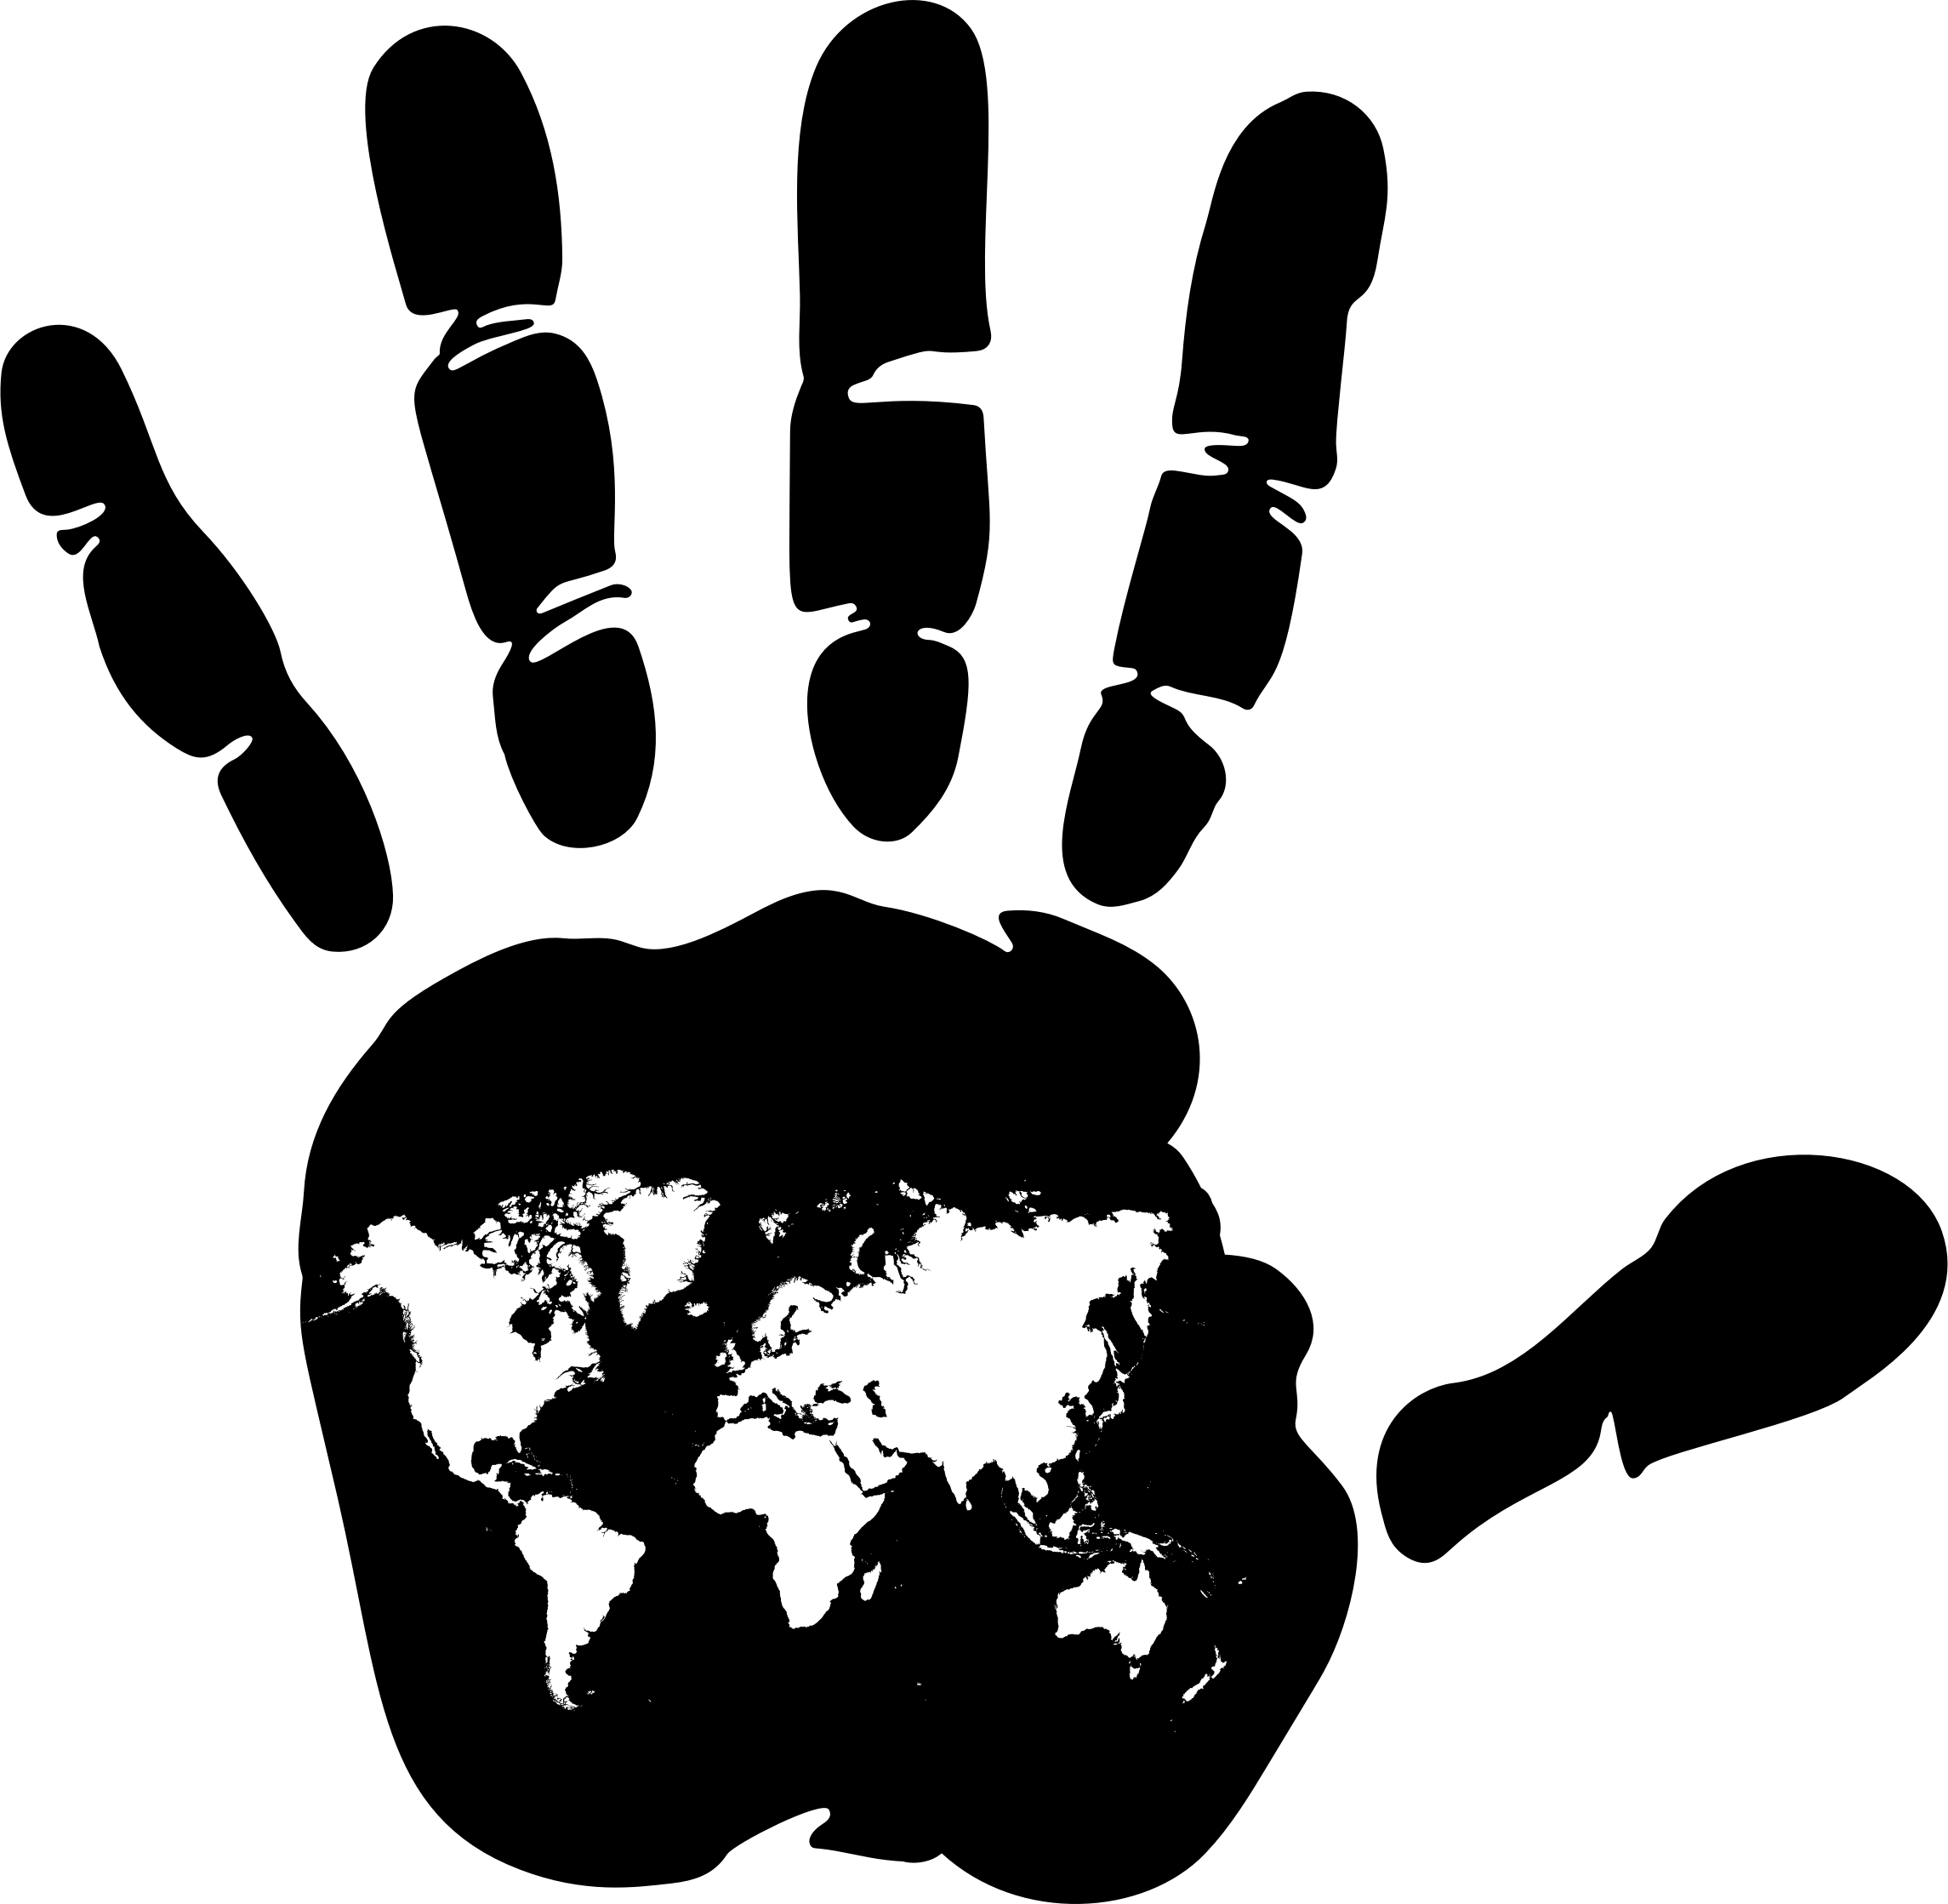 Map handprint big image. Clipart world hand clipart